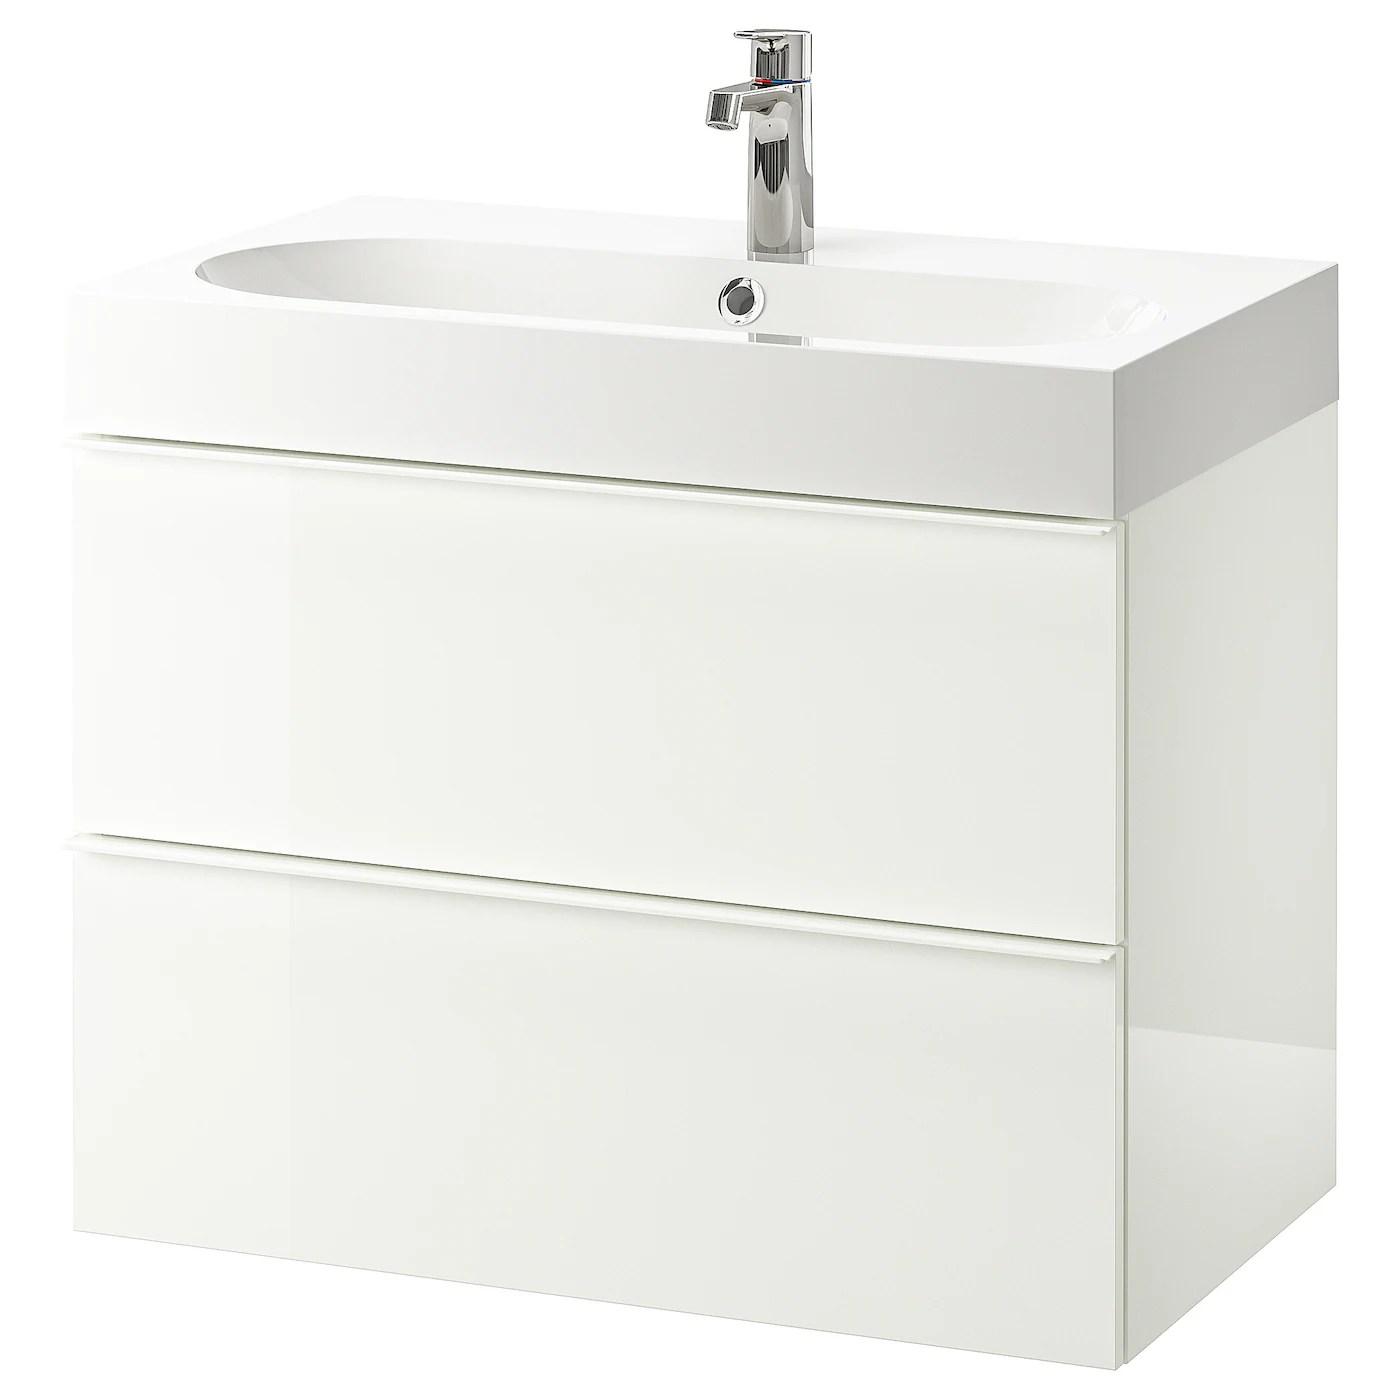 godmorgon braviken sink cabinet with 2 drawers high gloss white brogrund faucet 31 1 2x18 7 8x26 3 4